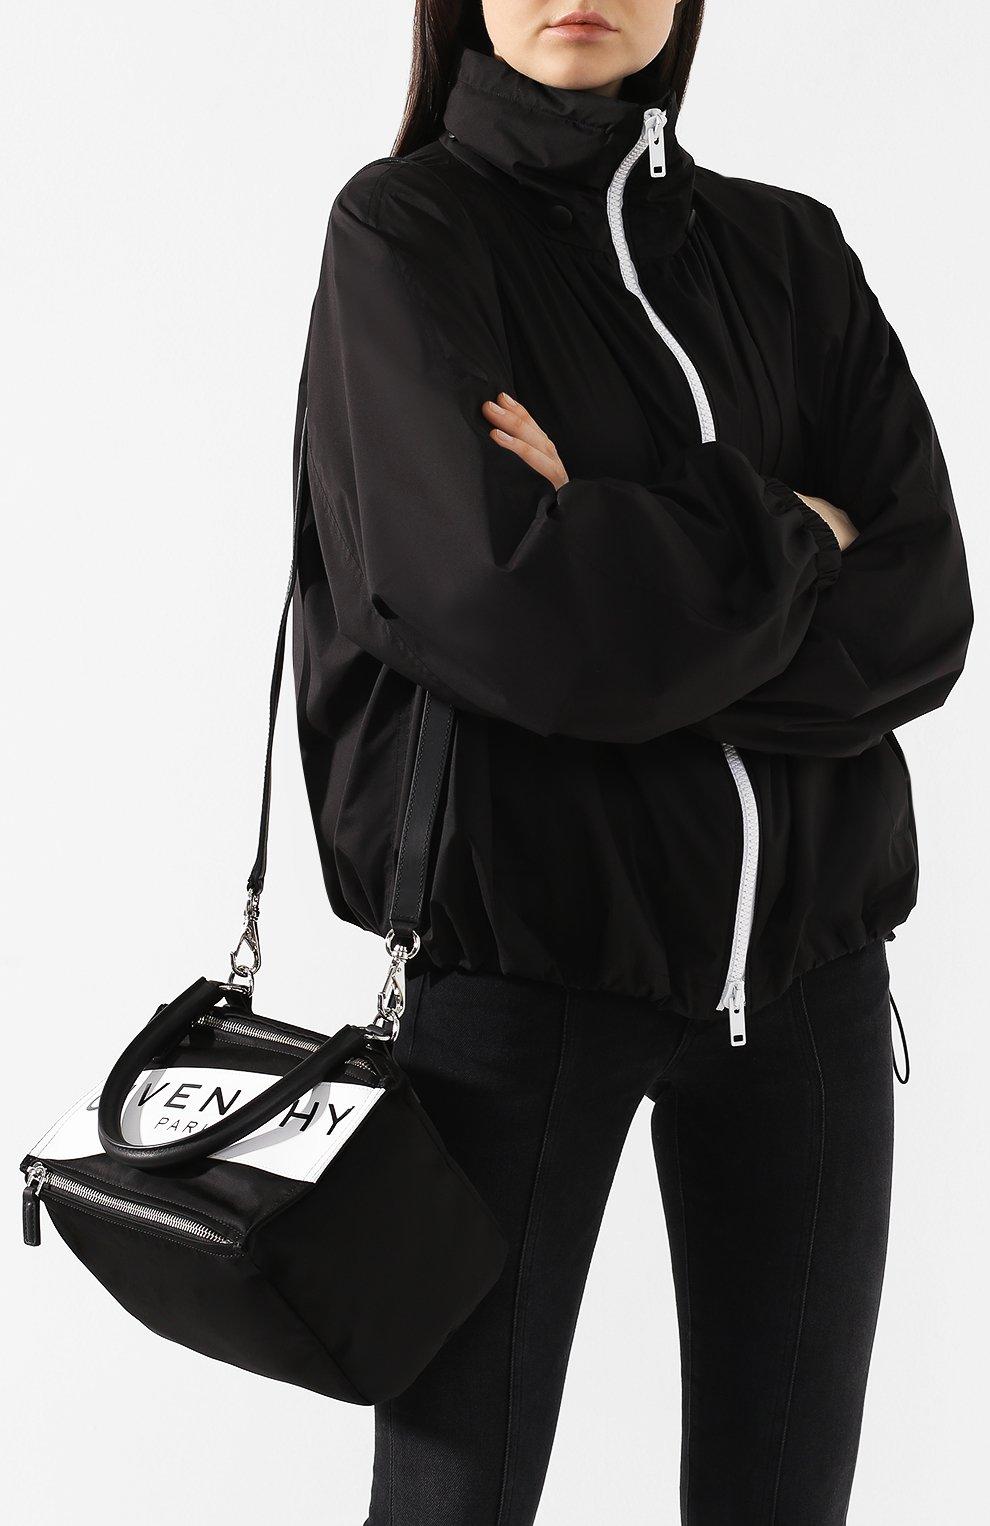 Сумка Pandora small Givenchy черная цвета | Фото №5